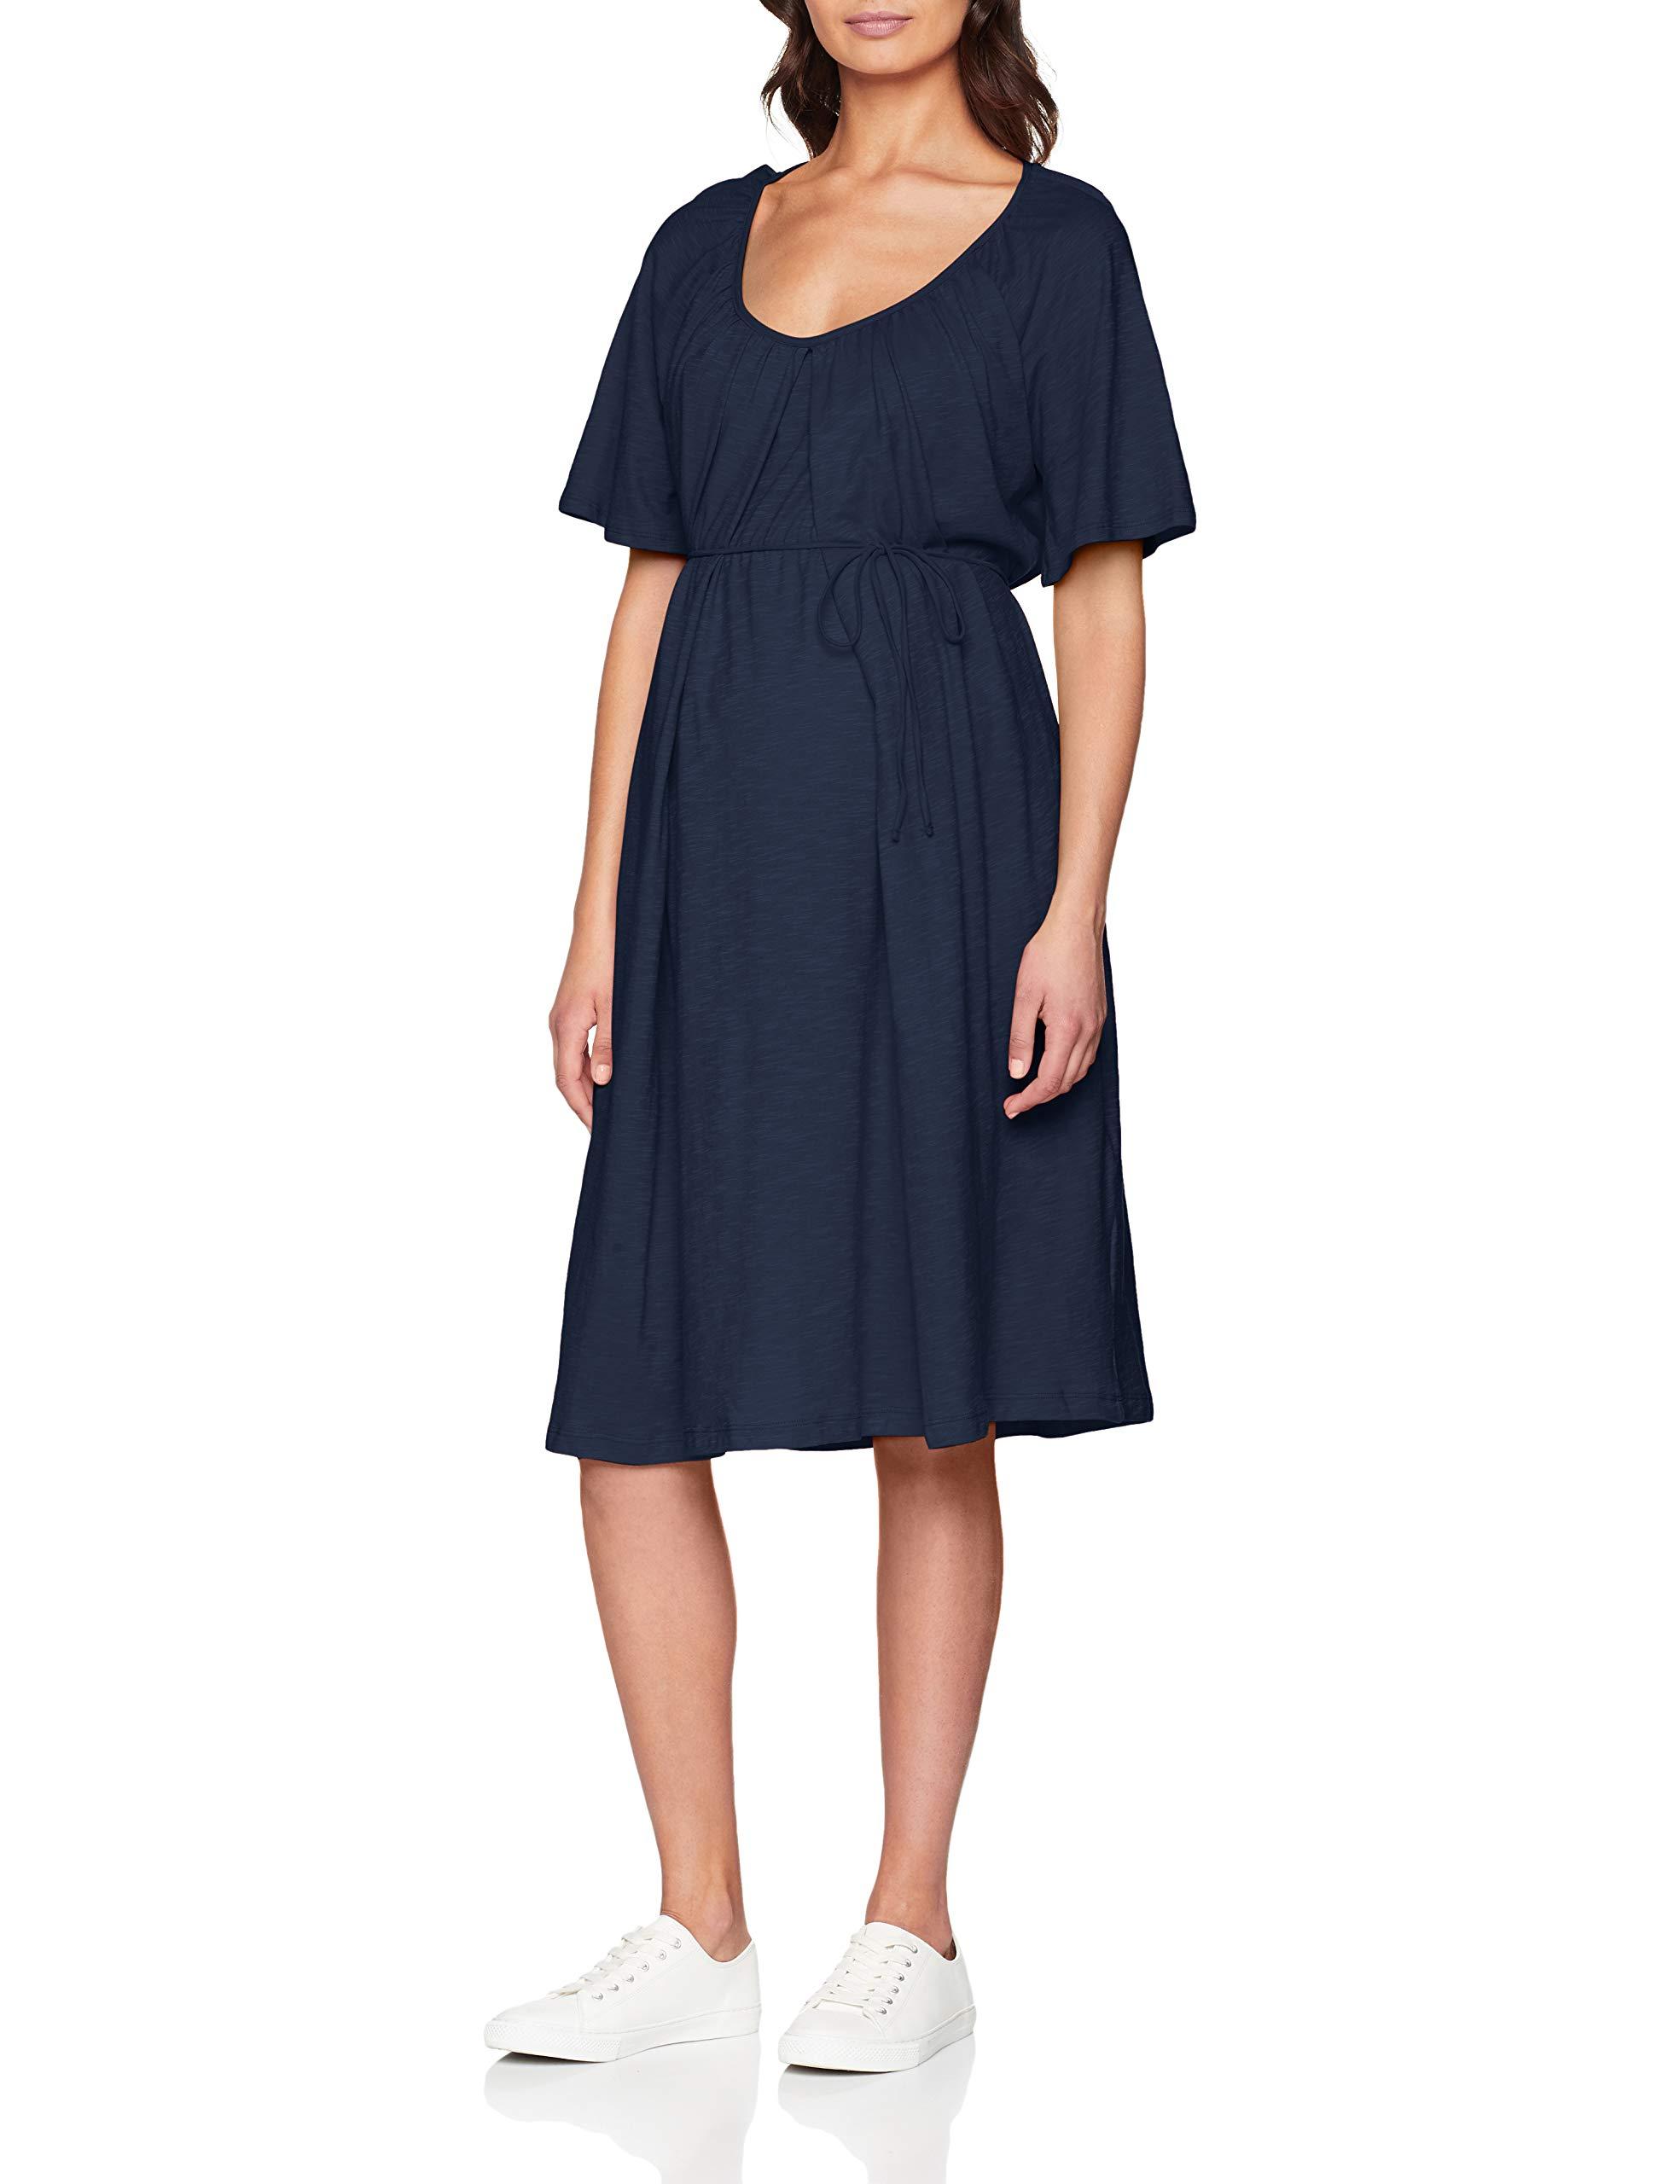 RobeBleumidnight Dress Blue Boob FabricantMediumFemme Maternity Breeze 558642taille Nursing 4RLqA35j